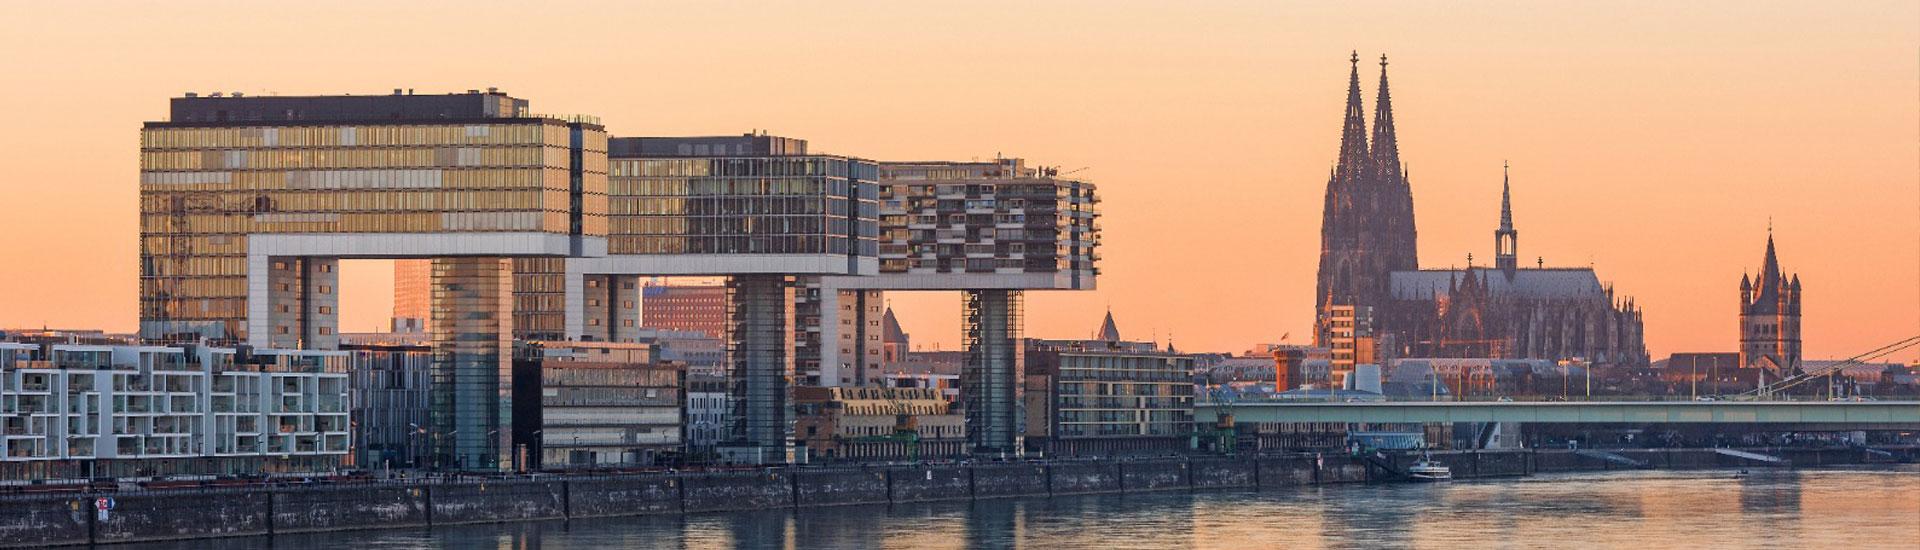 Spedition-Köln-Logistikunternehmen